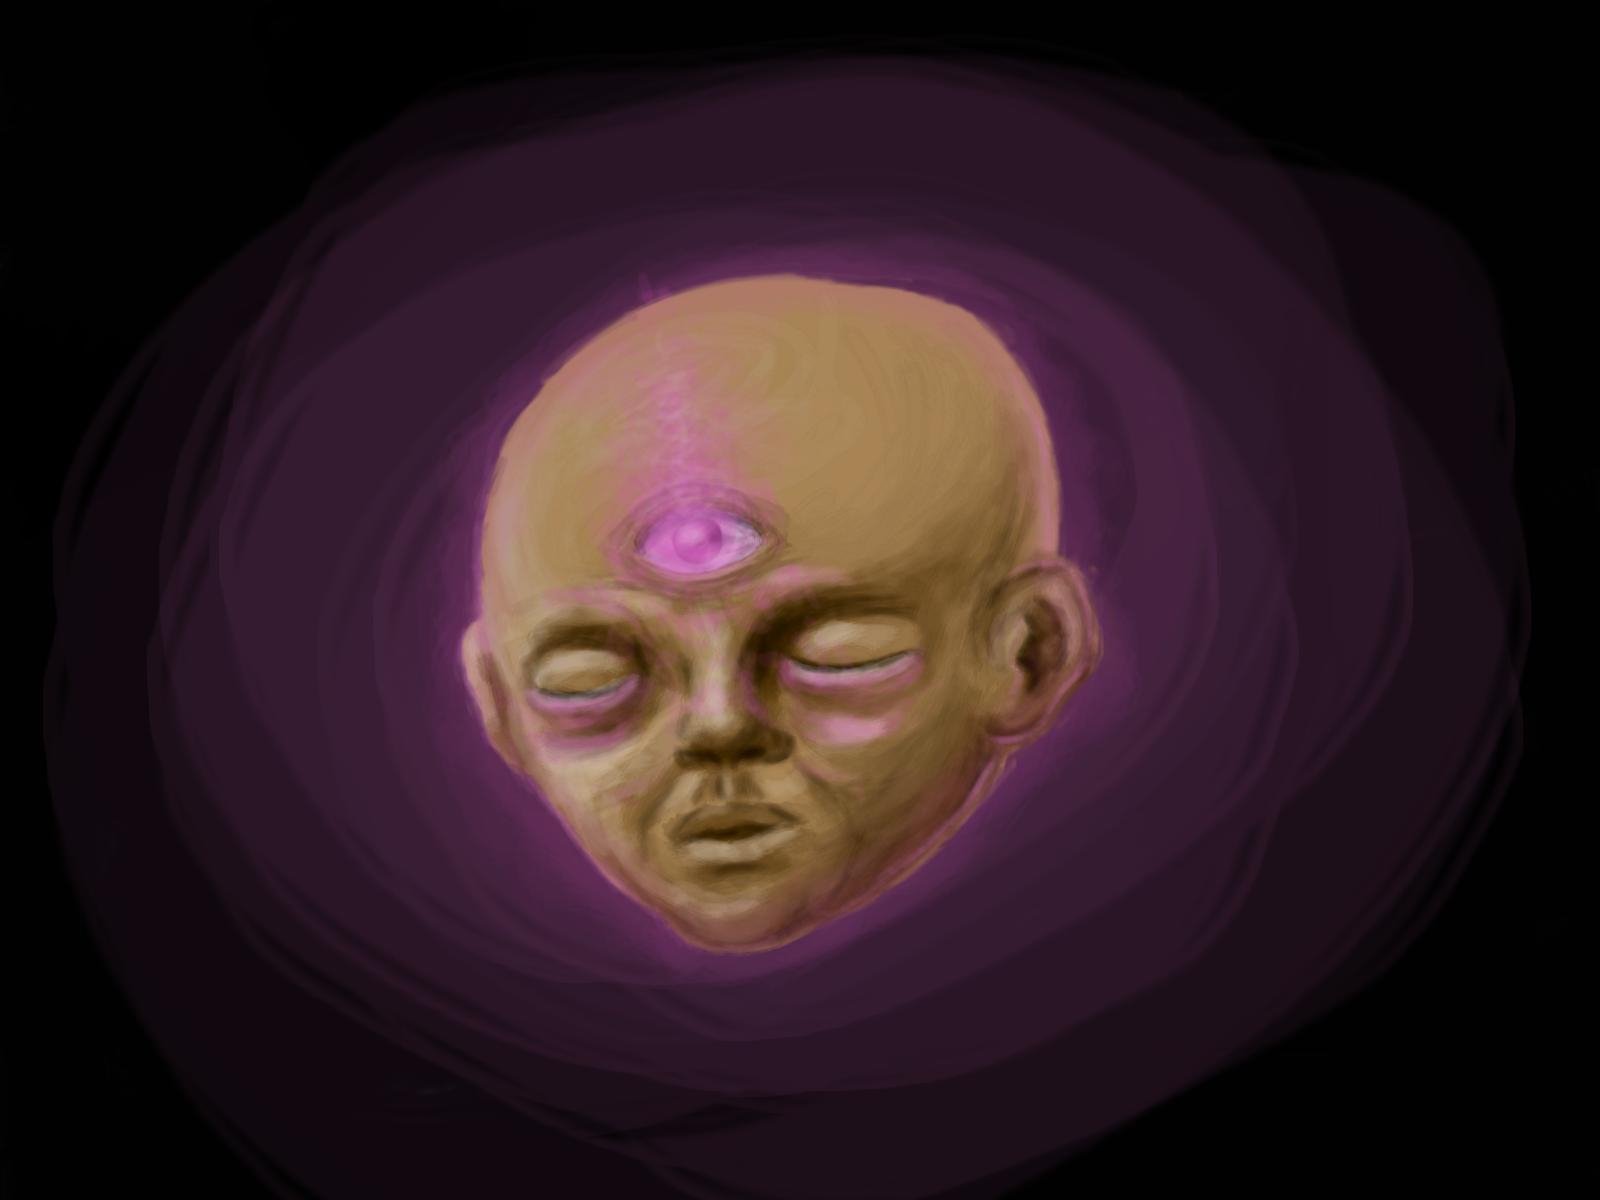 Cosmic Baby Net Worth